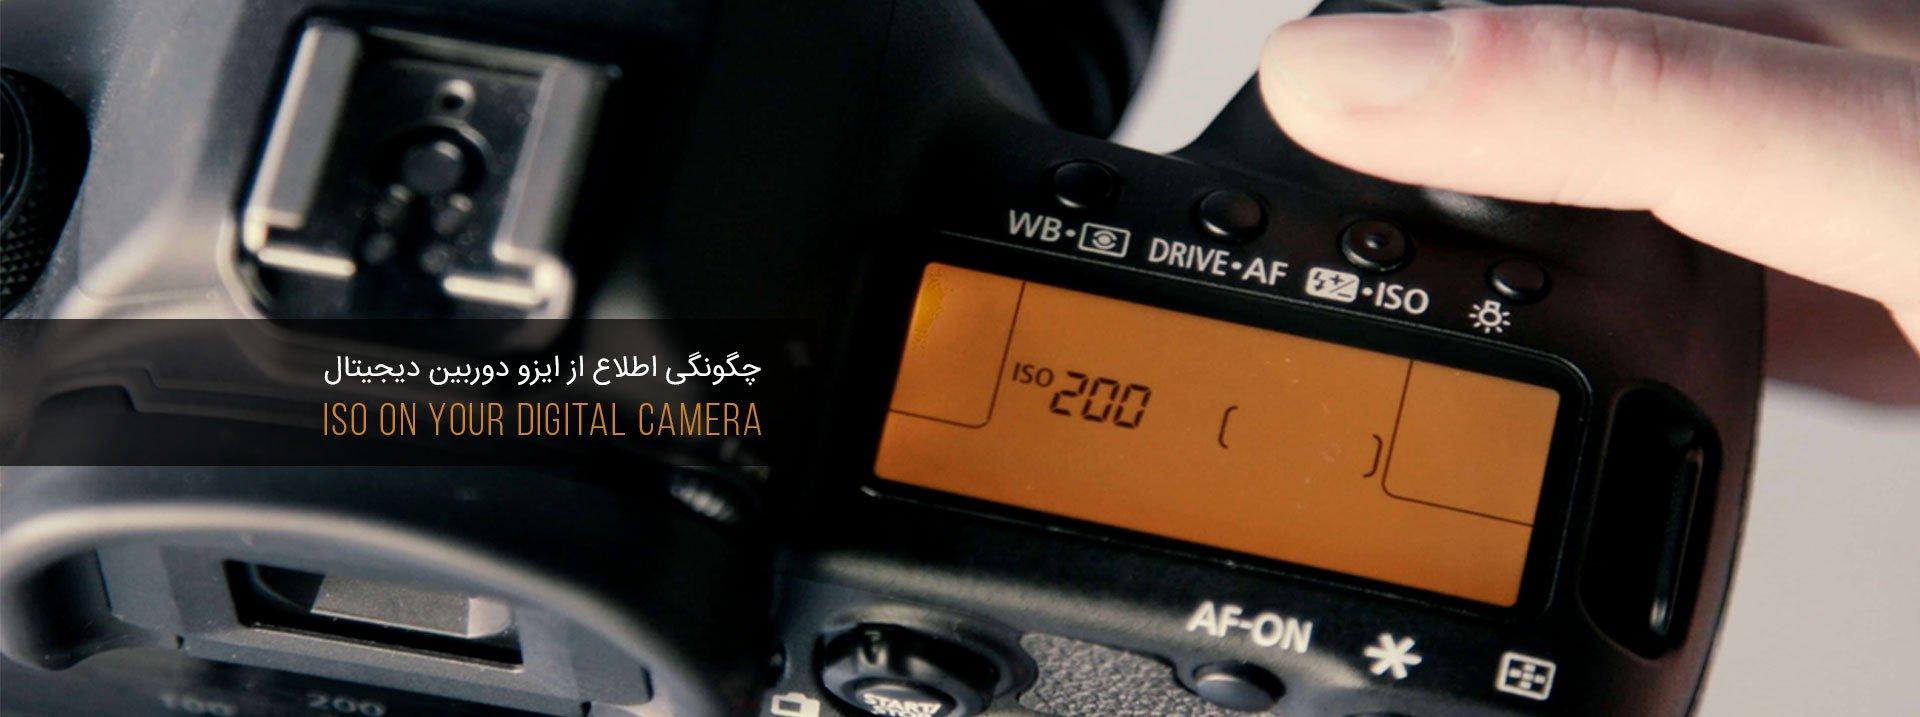 akasi iso camera1 - چگونگی اطلاع از ایزو دوربین دیجیتال